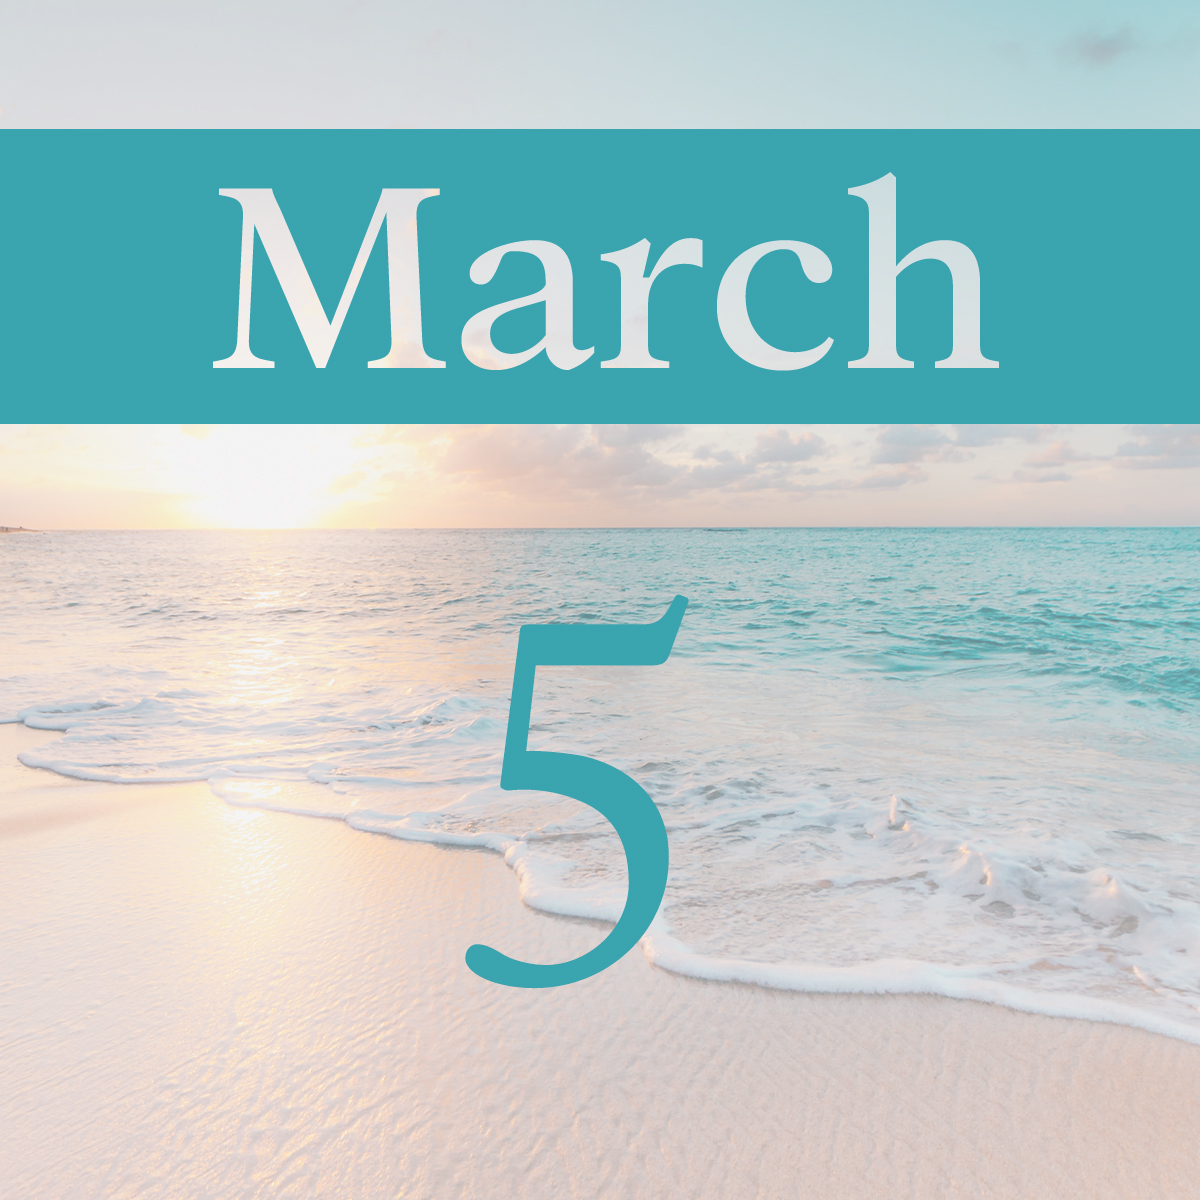 Thursday, March 5th